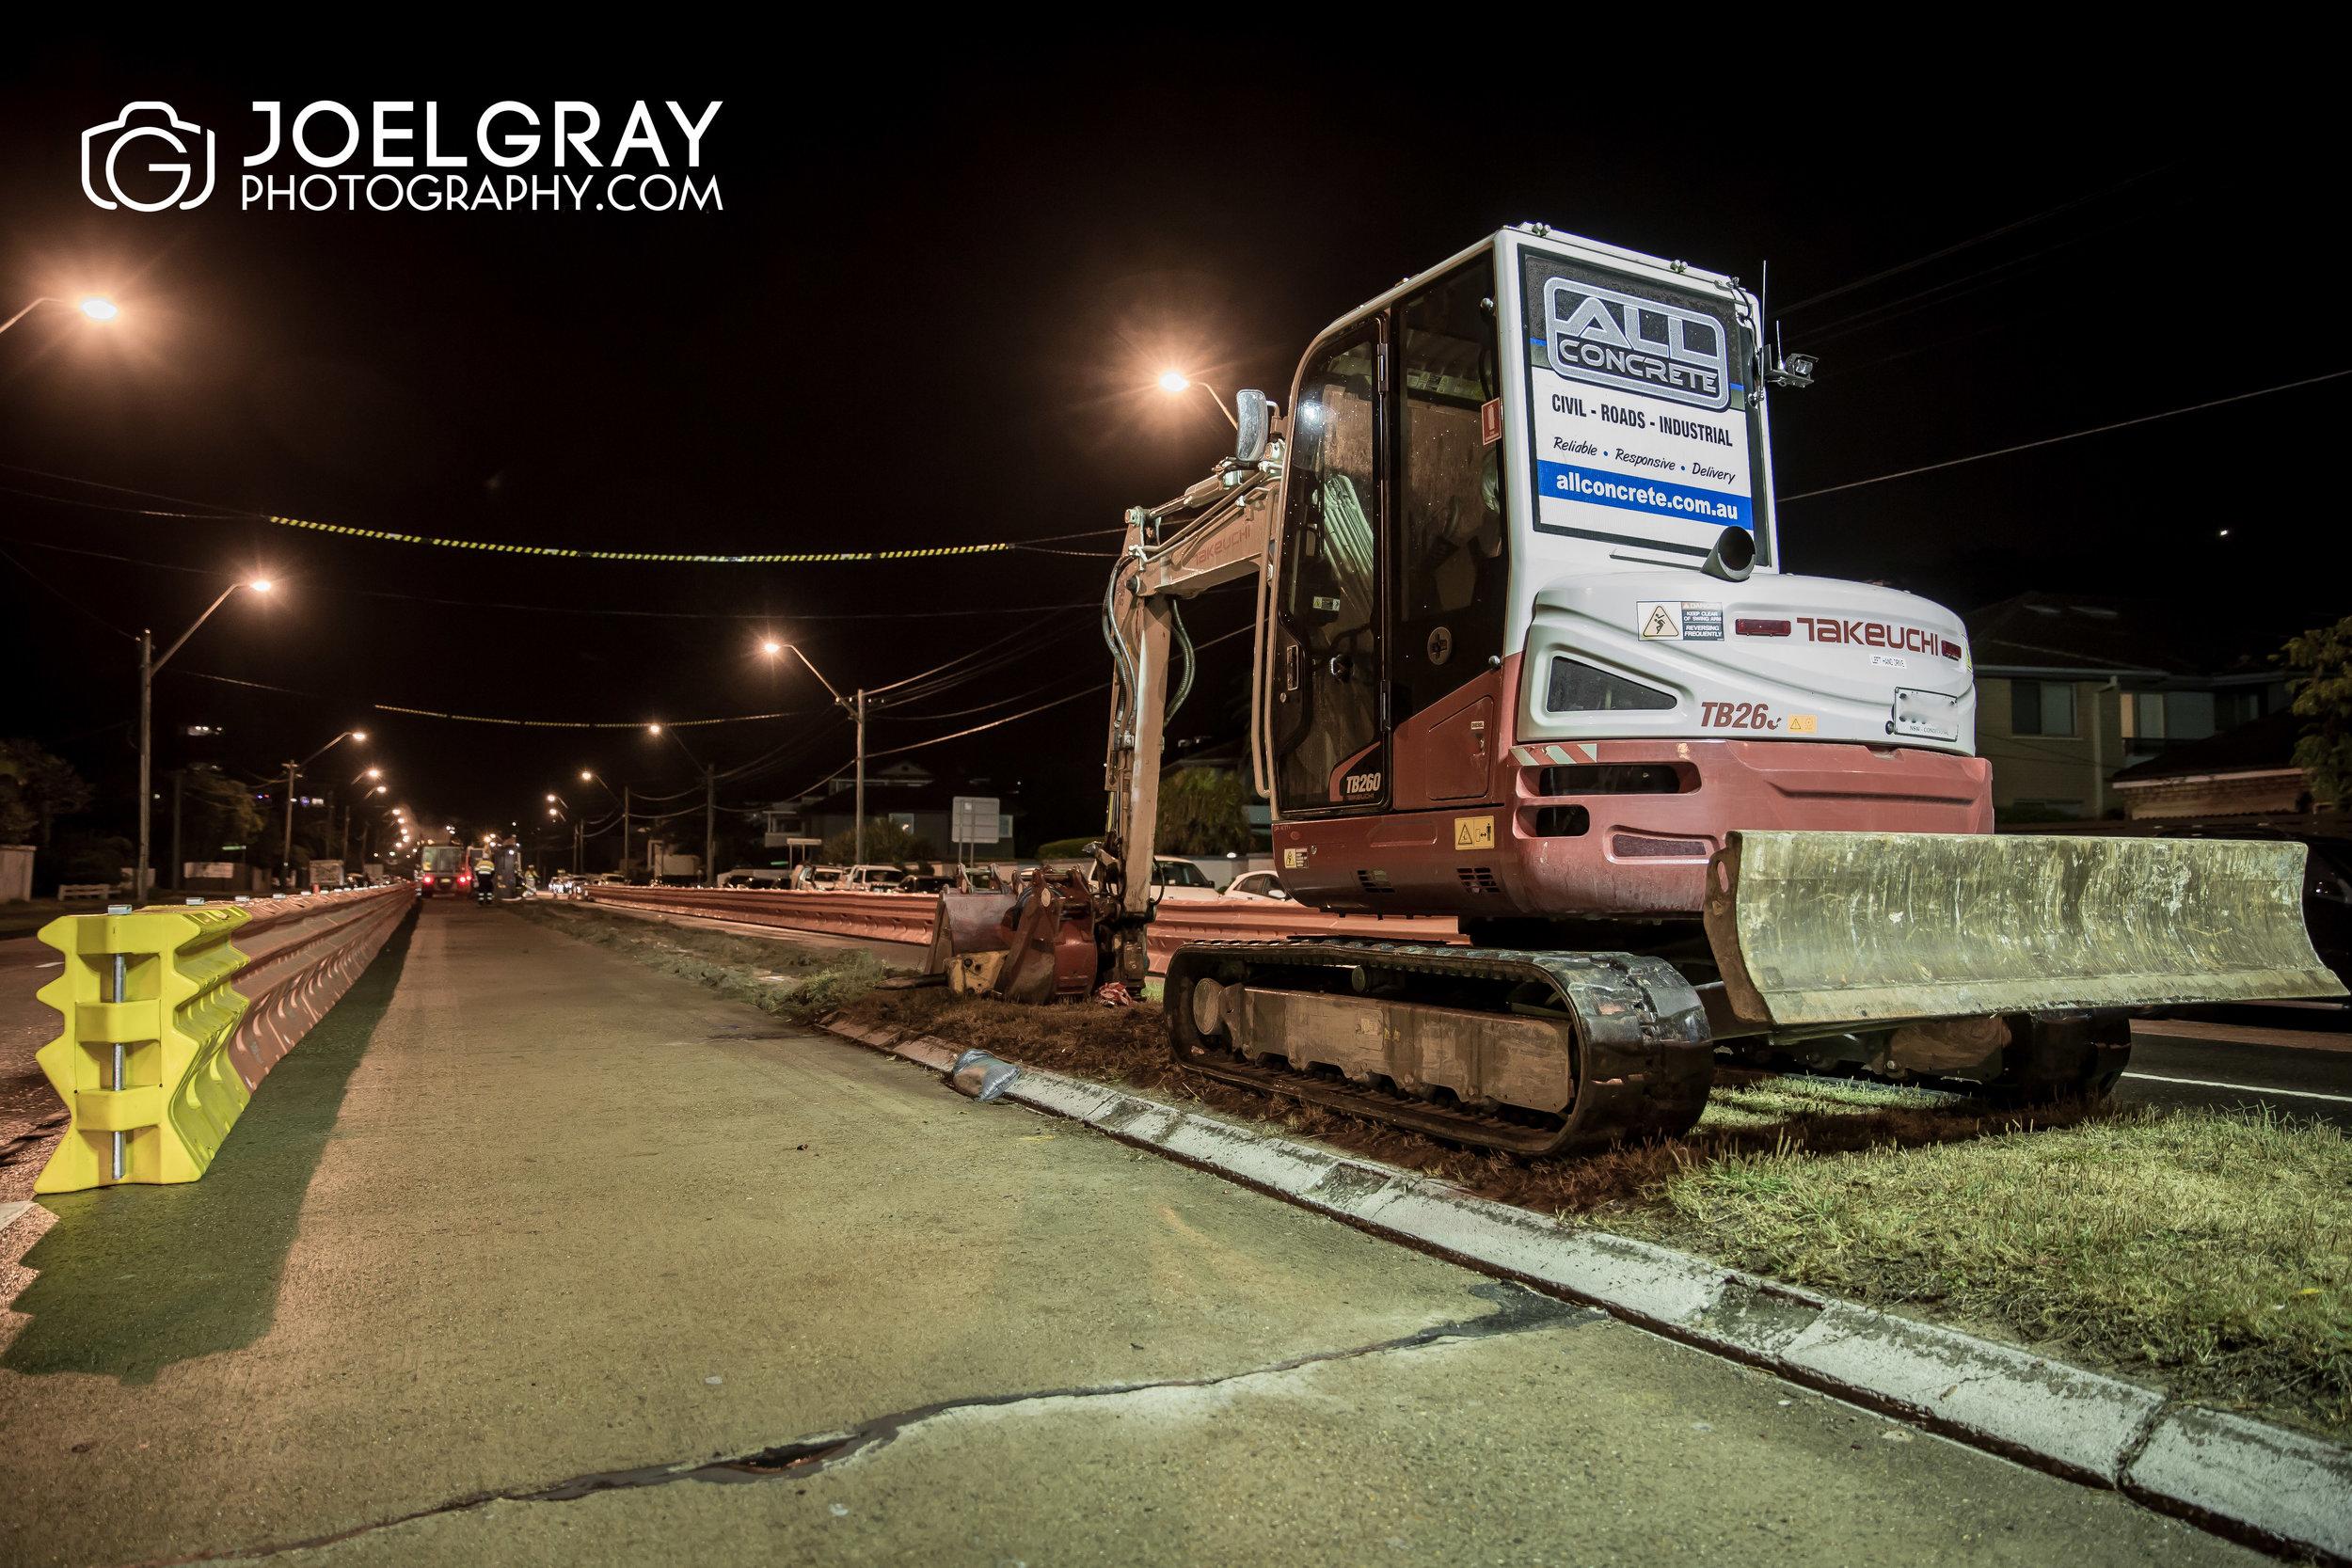 sydney-civil-contractors-jobsite-worksite-photographer